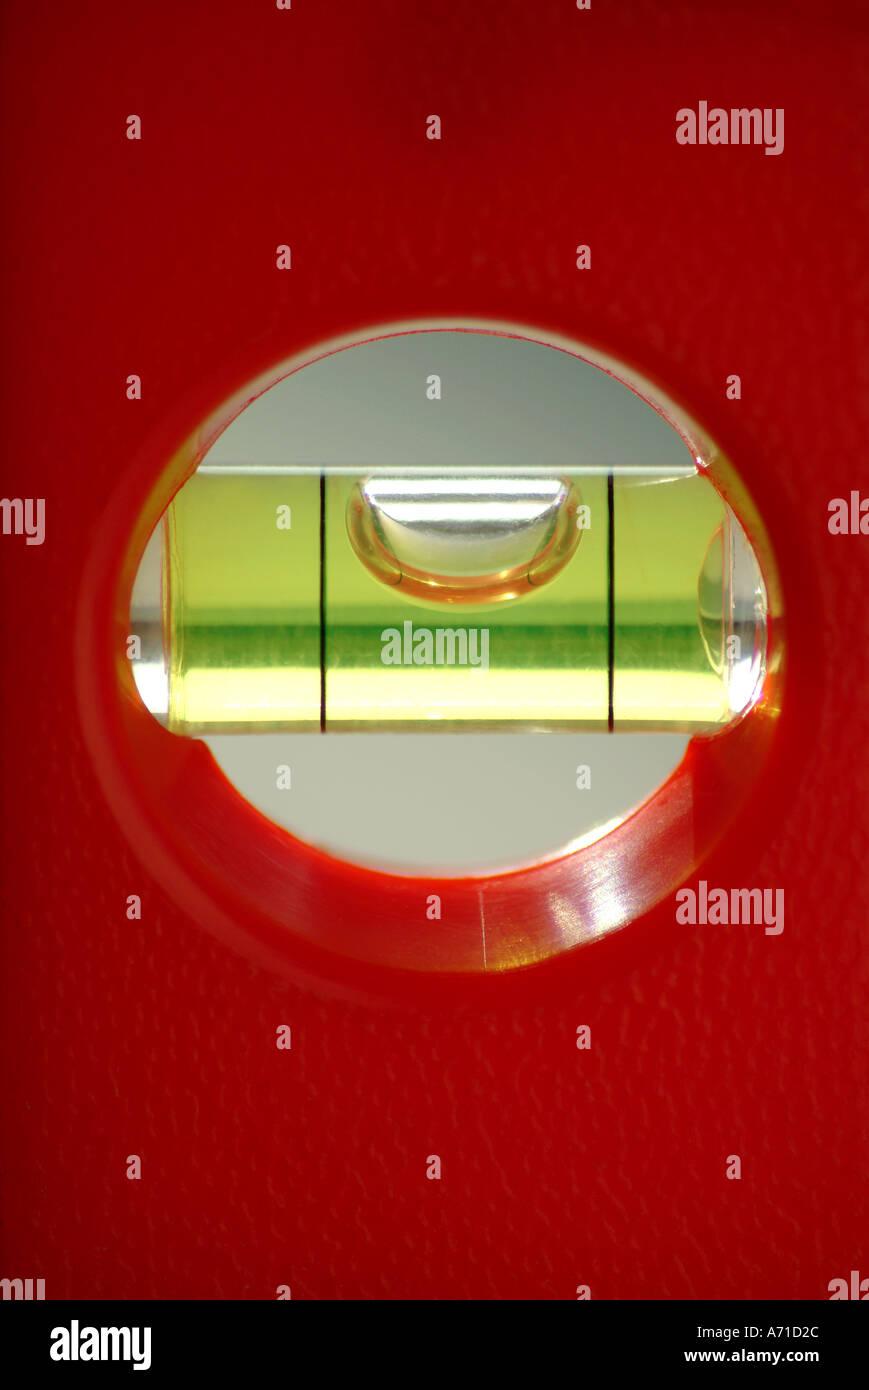 red spirit level bubble - Stock Image